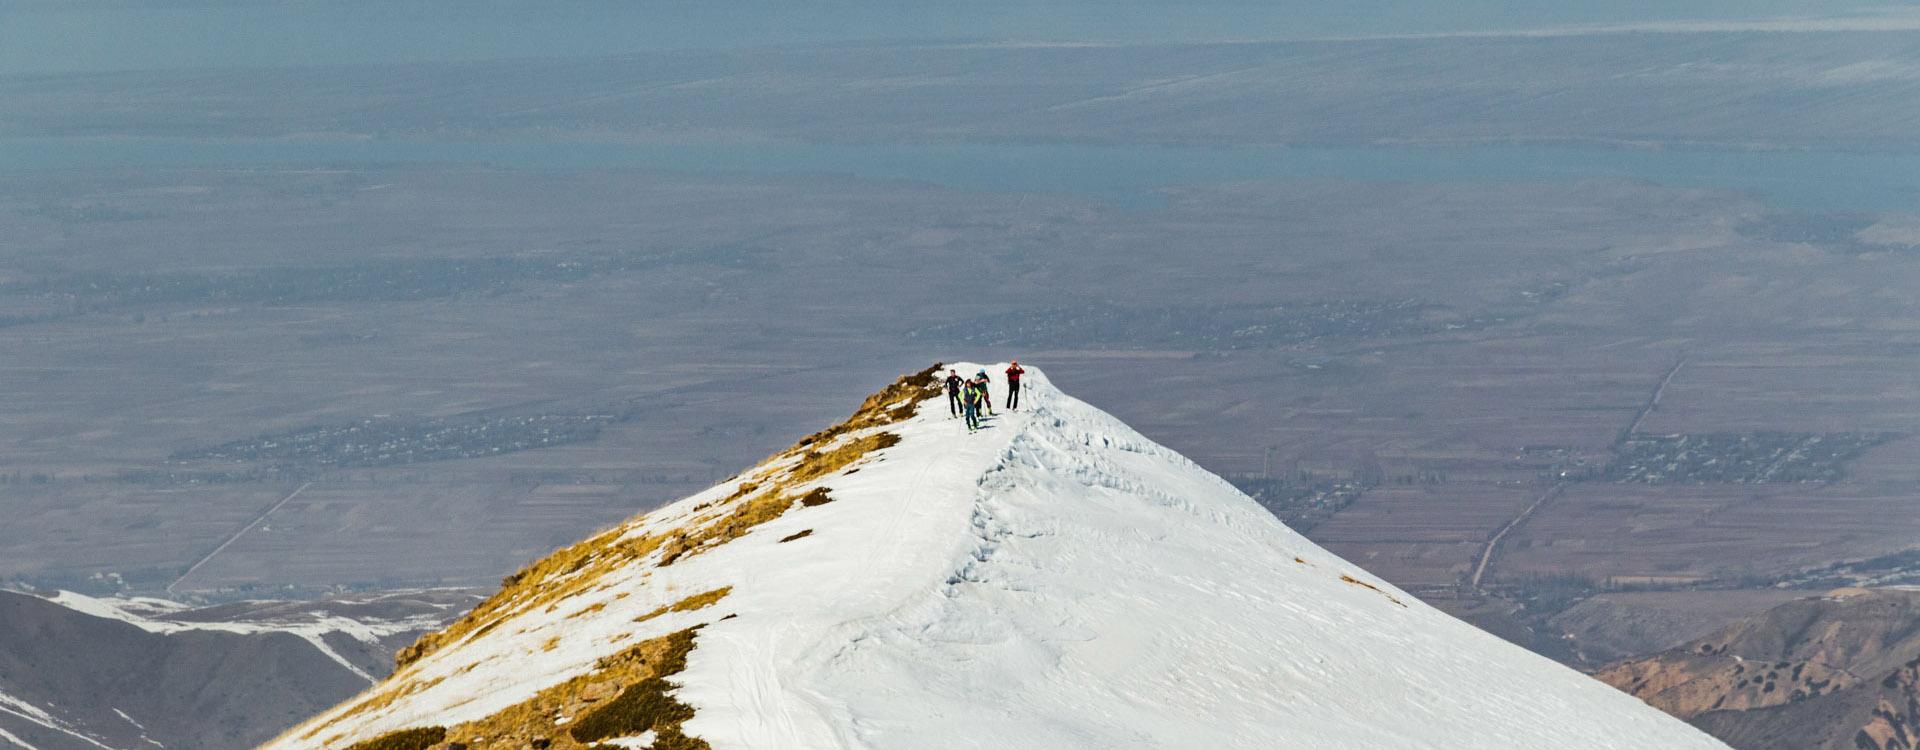 reise-nach-kirgisistan-zum-skitouren.jpg